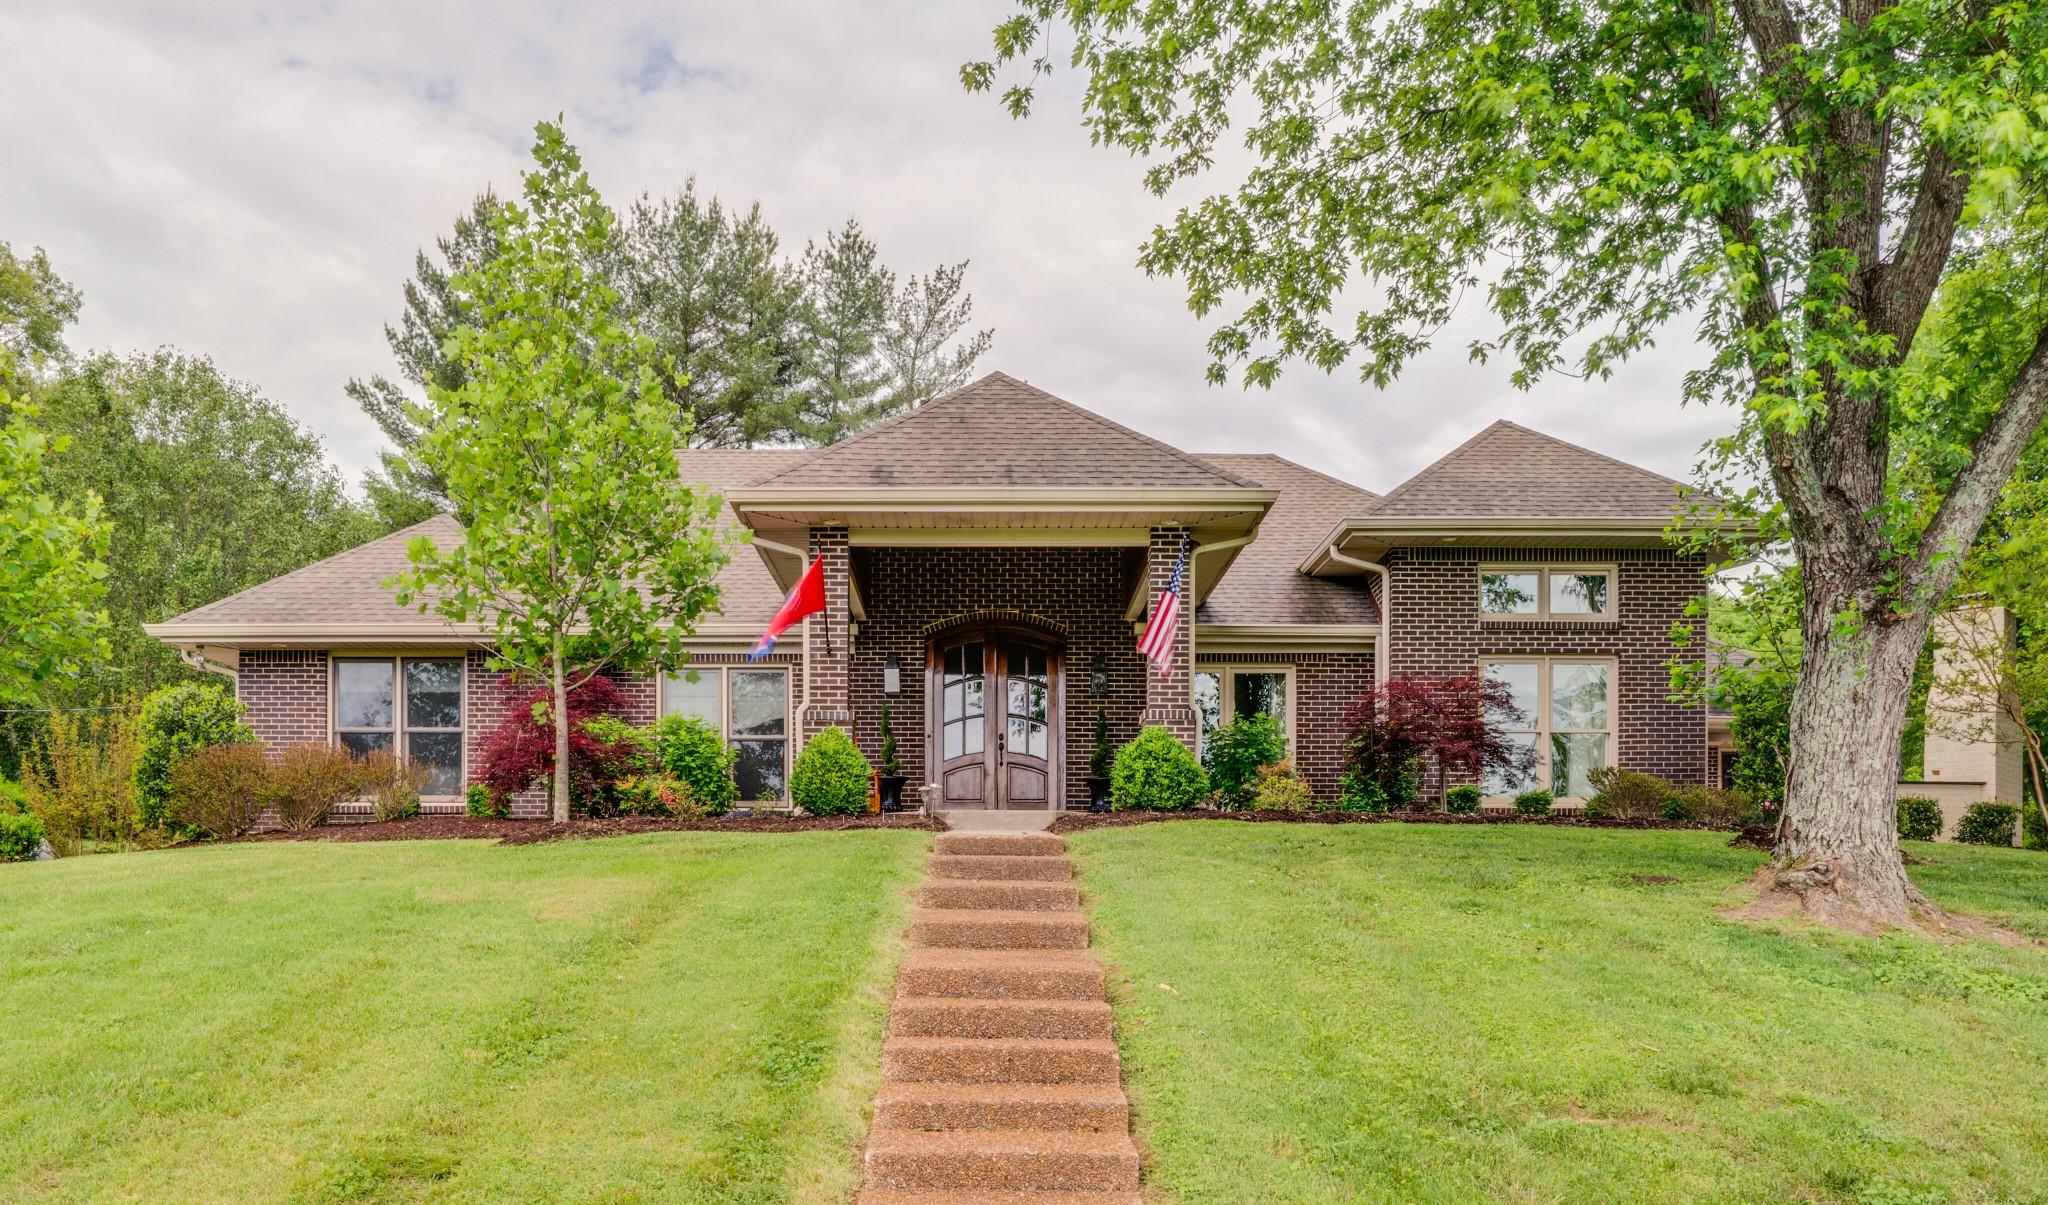 1248 Madison Creek Rd, Goodlettsville, TN 37072 - Goodlettsville, TN real estate listing